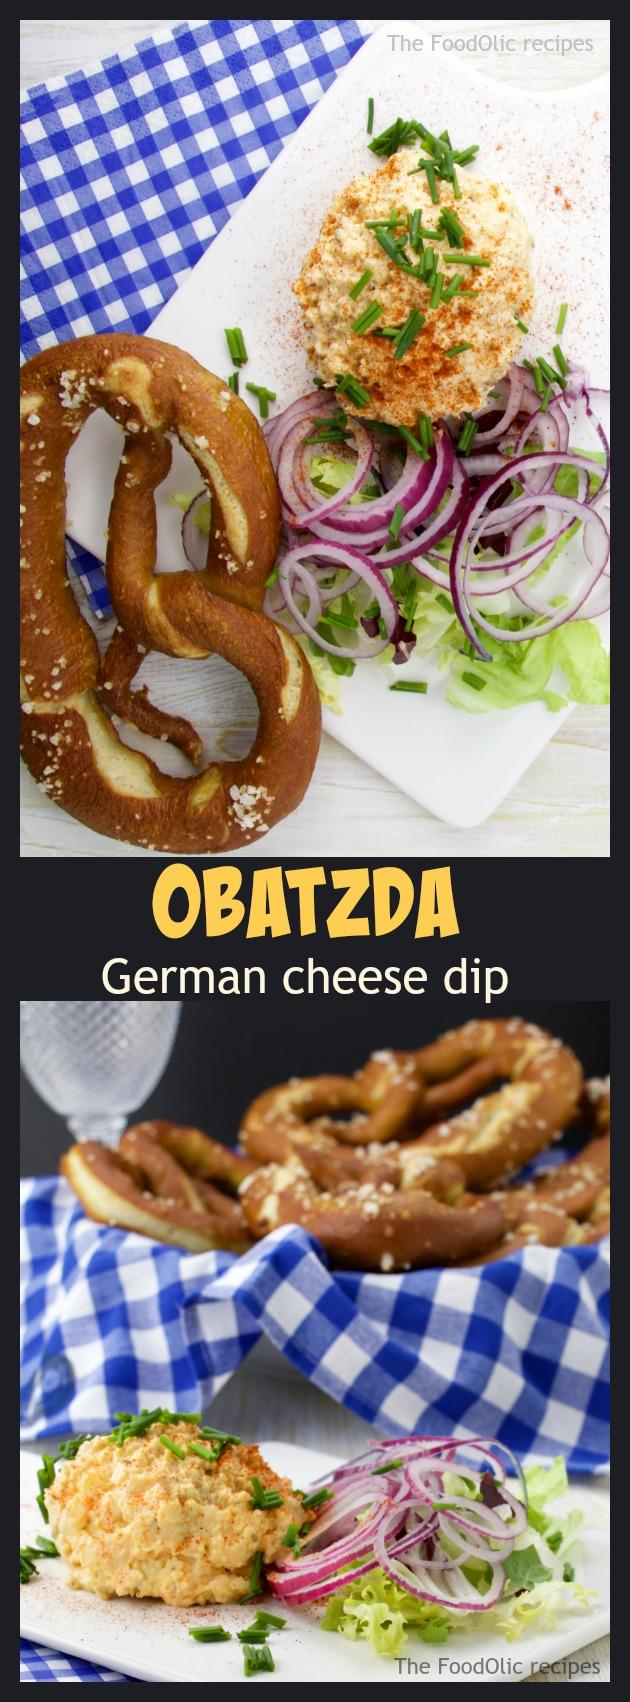 obatzdapin